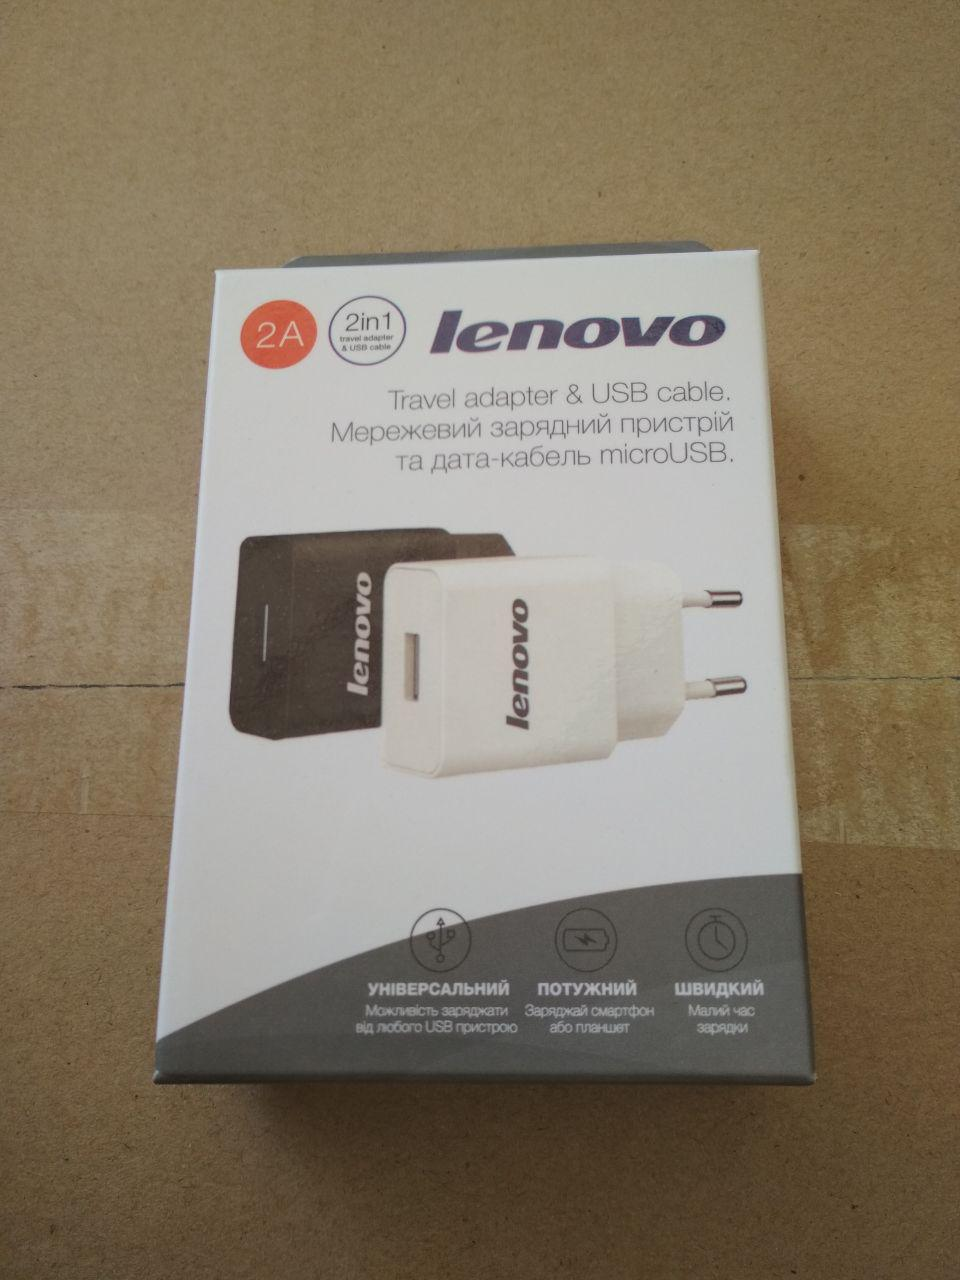 СЗУ Lenovo (кабель + адаптер) 2A